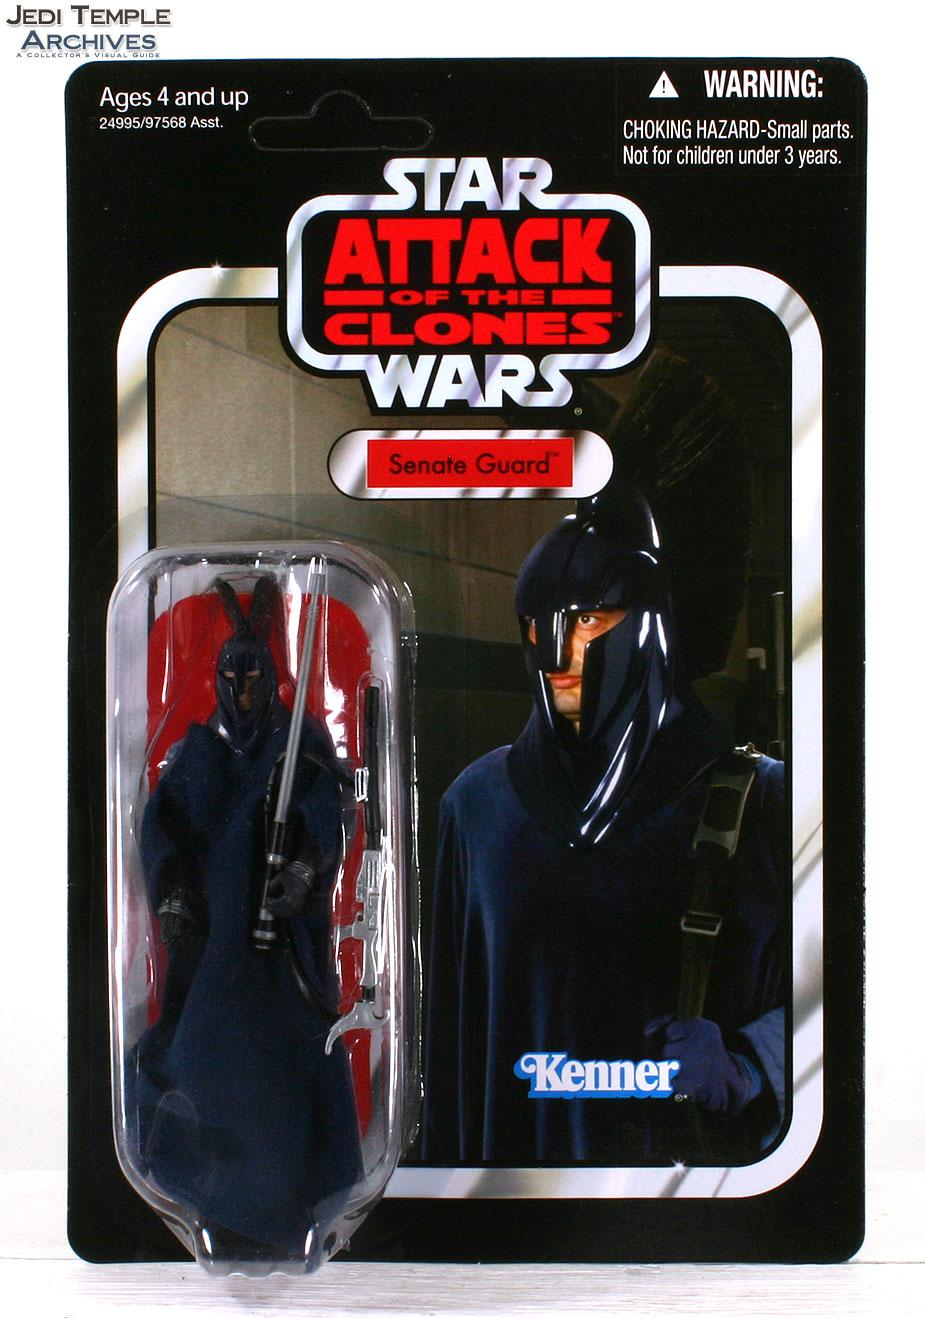 Senate Guard